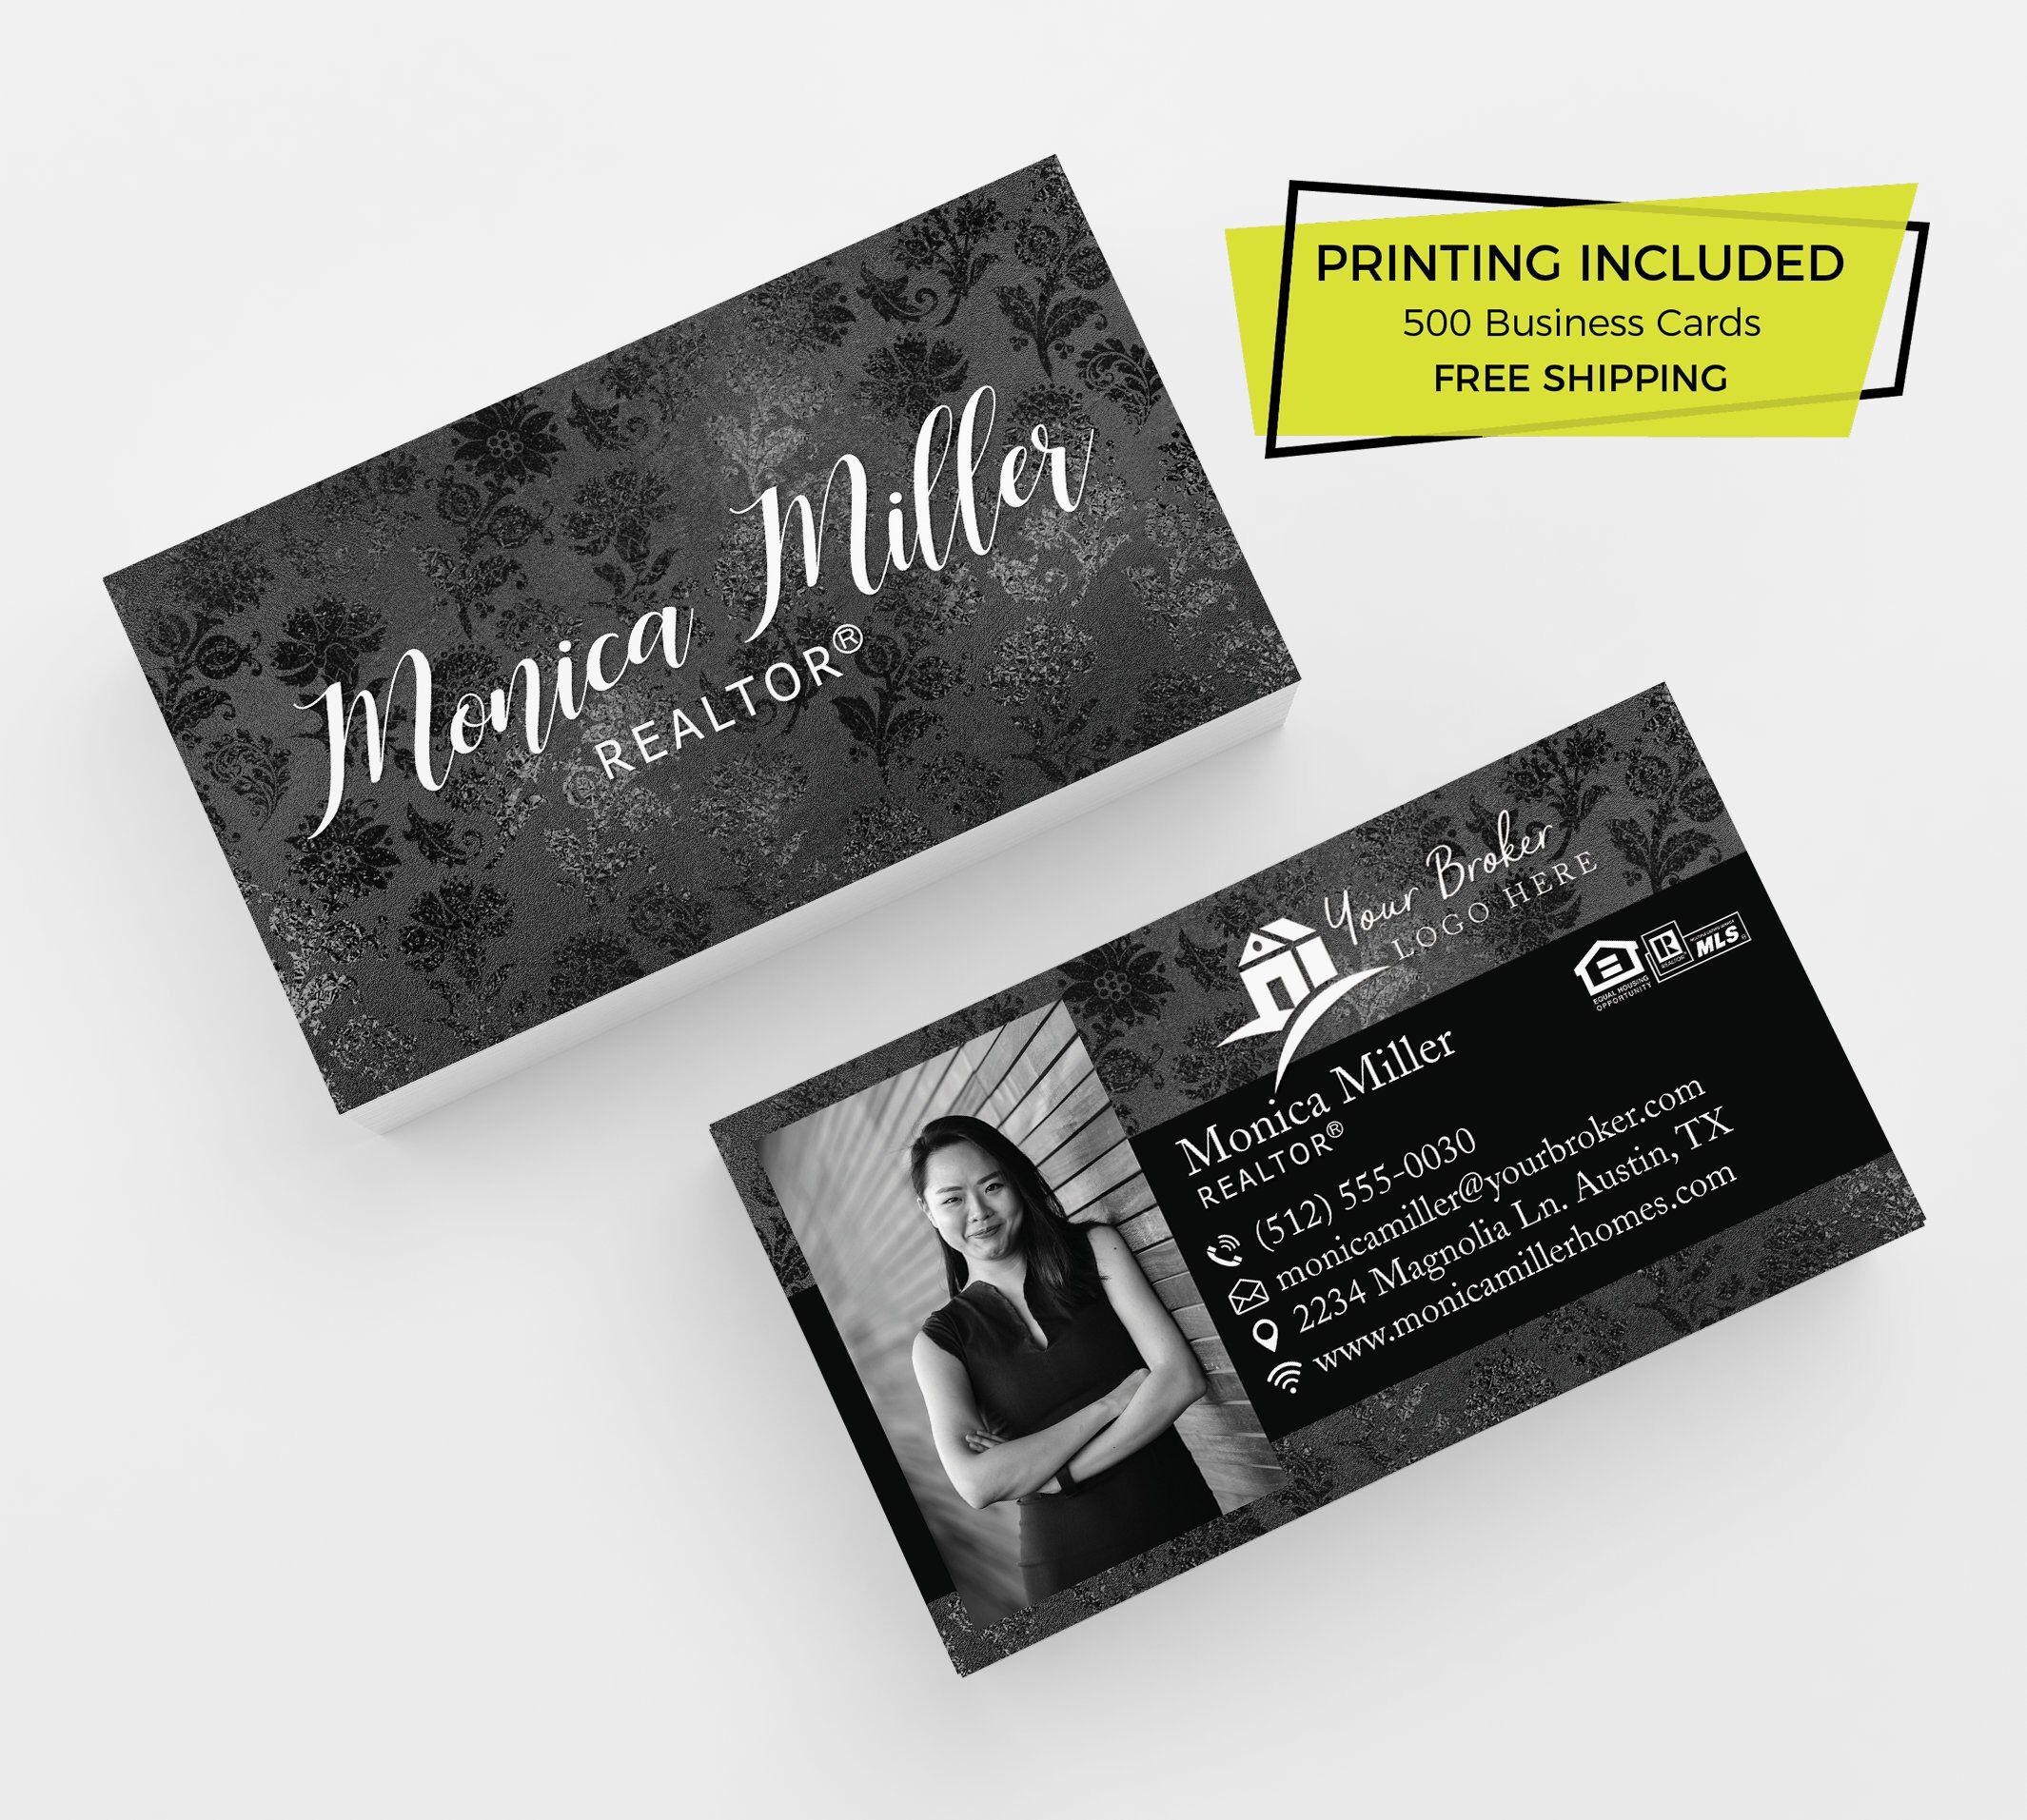 Black Floral Realtor Business Card 500 Printed Business Cards Etsy Realtor Business Cards Unique Business Cards Real Estate Agent Business Cards